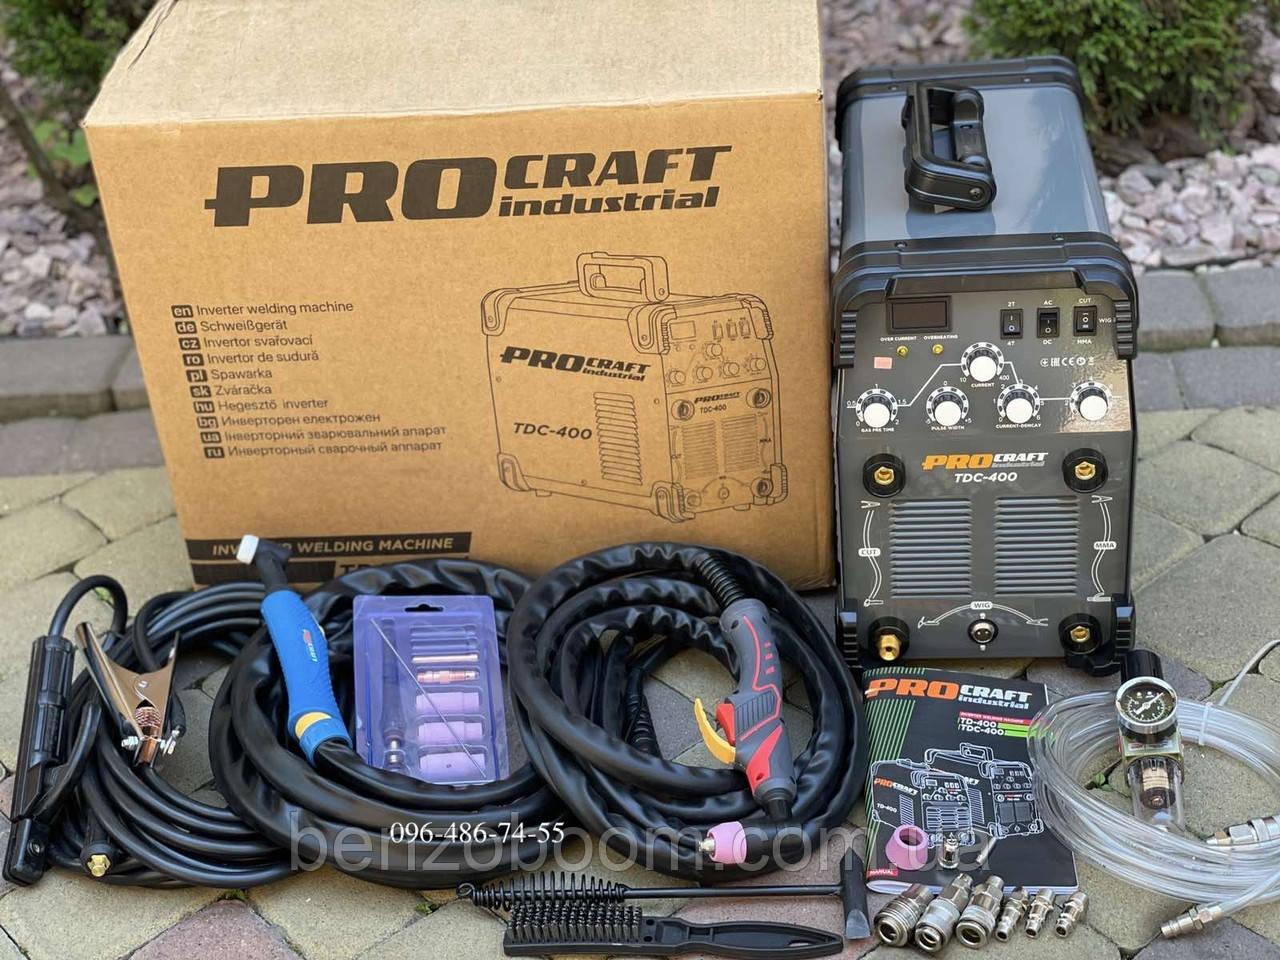 Procraft Industrial TIG/CUT/MMA TDС-400 AC/DC сварка алюминия/плазморез/инвертор